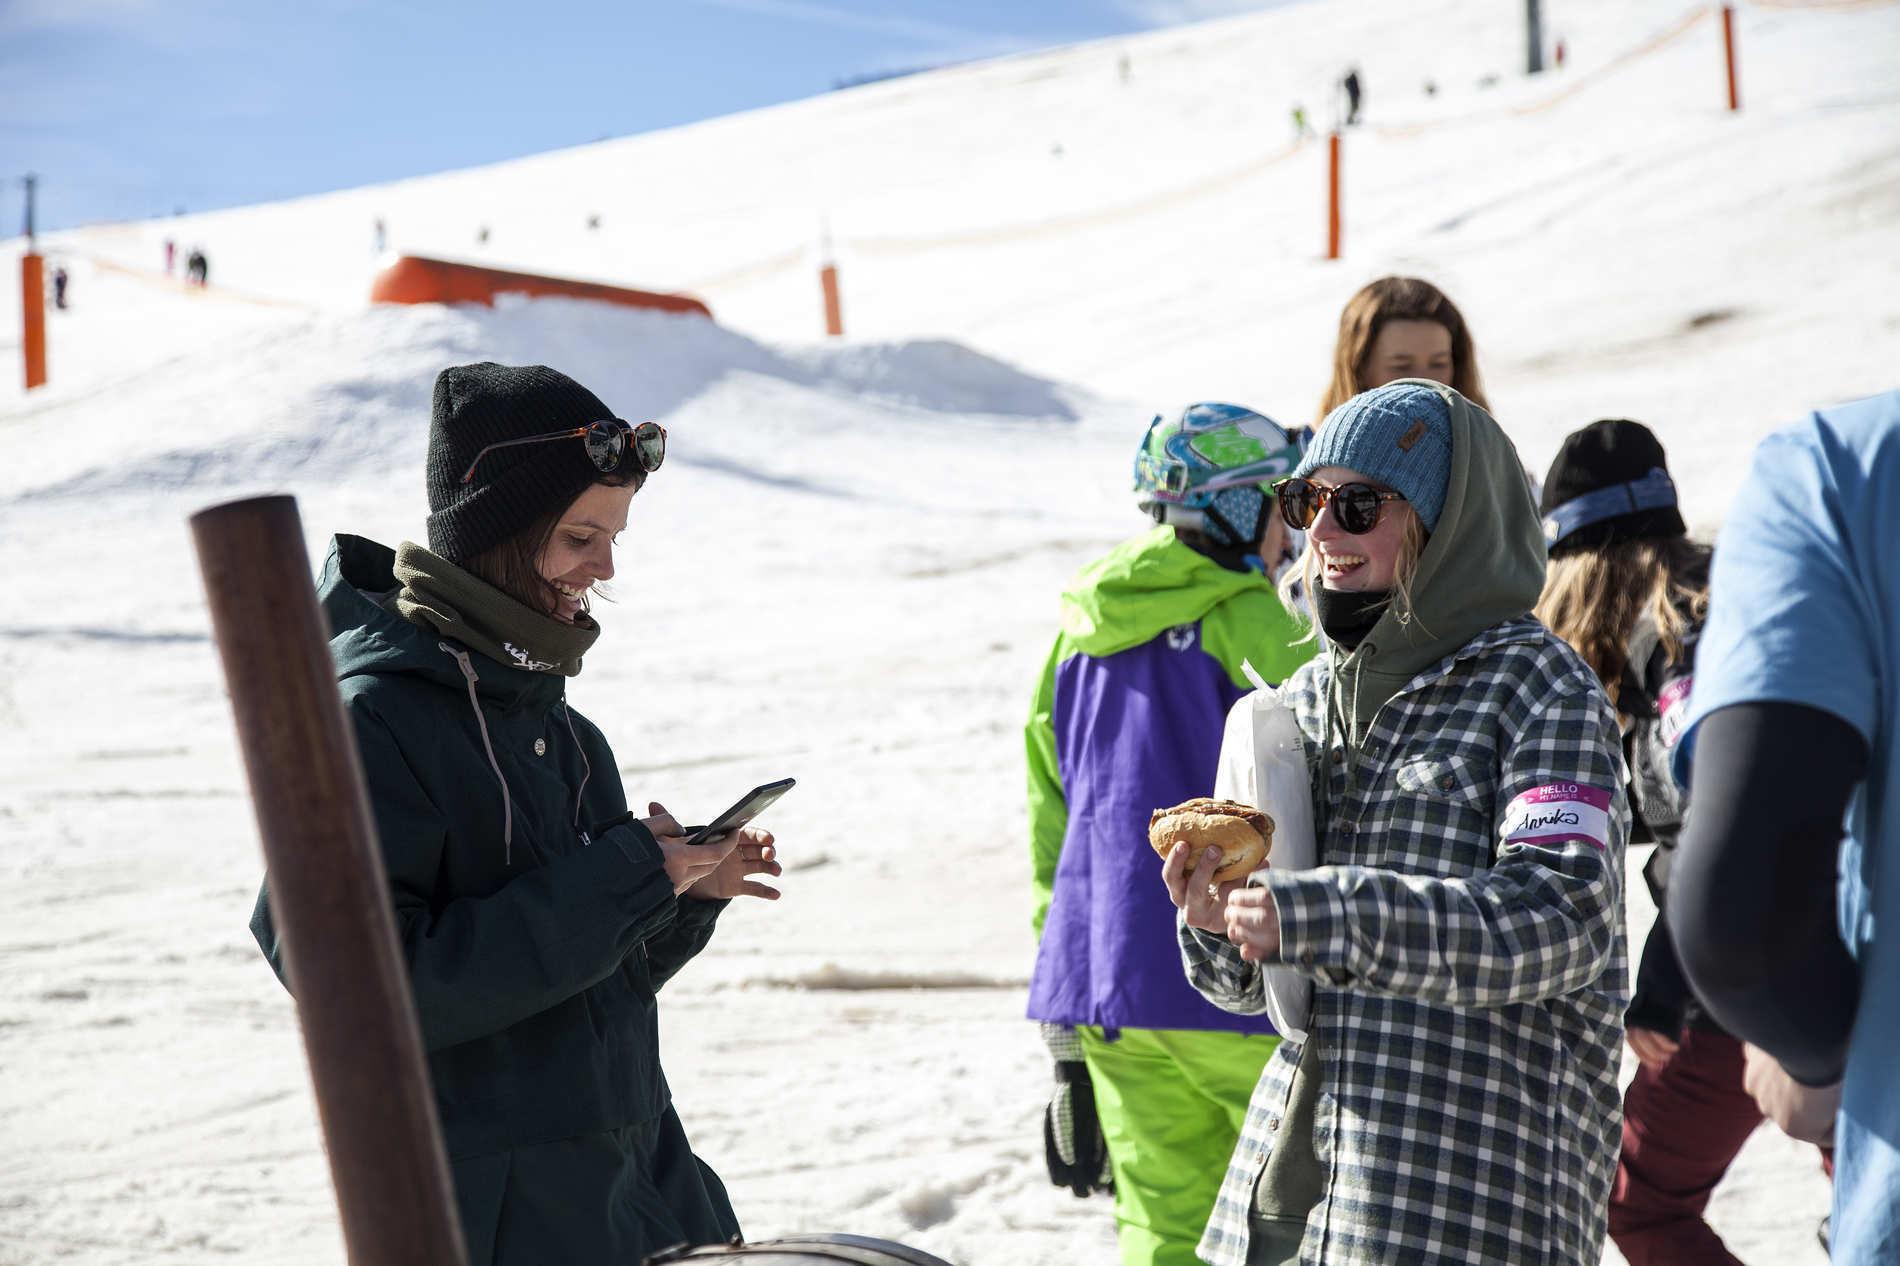 web snowpark feldberg 25 02 2017 lifestyle fs sb martin herrmann qparks 23